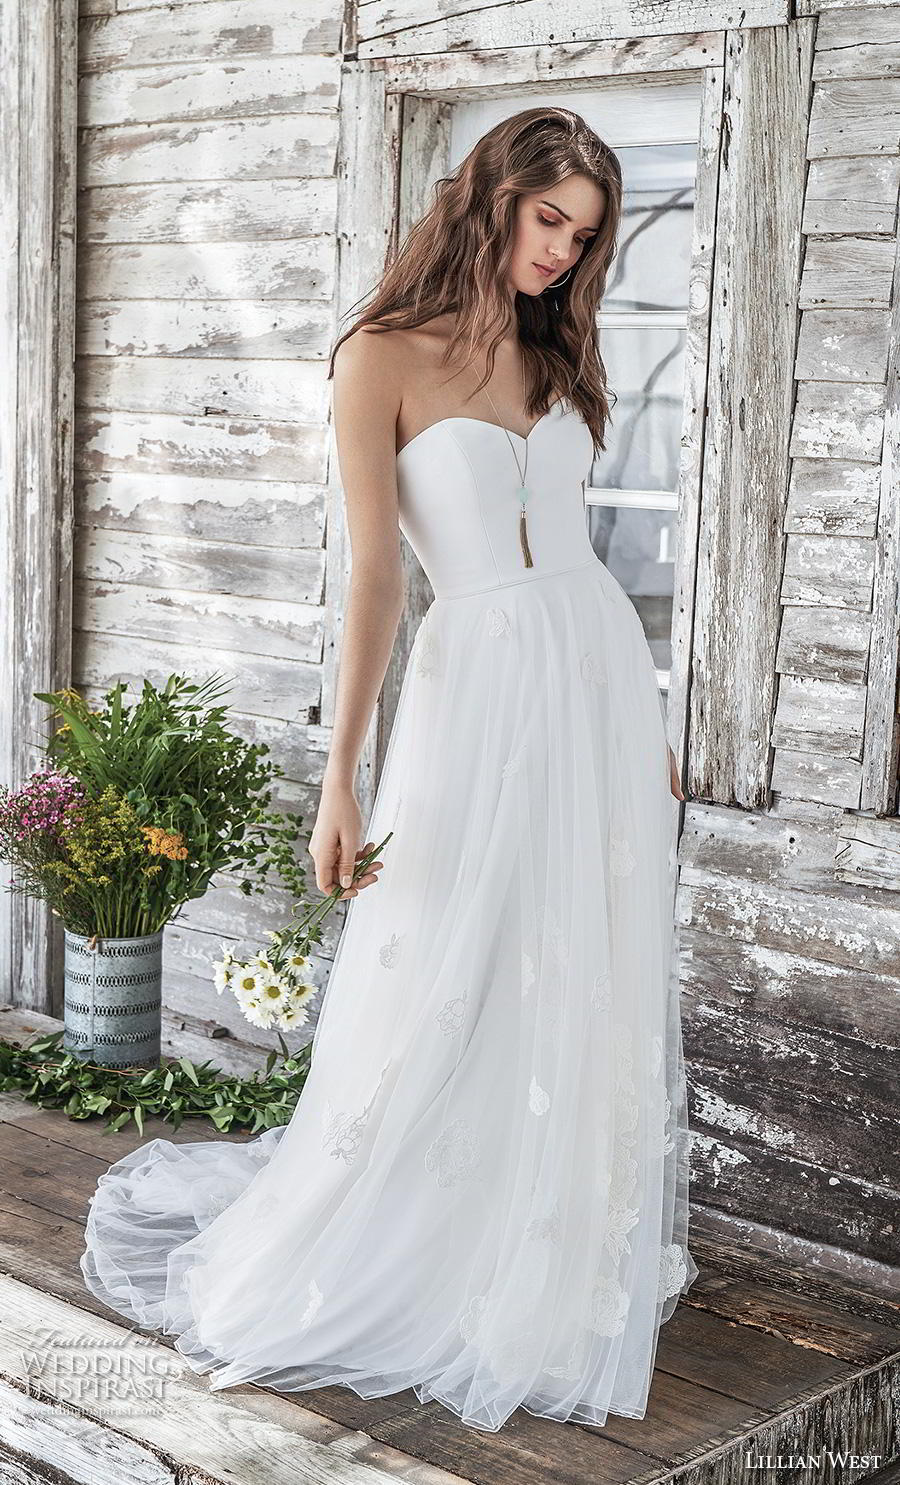 Lillian West Spring 2019 Wedding Dresses | Wedding Inspirasi